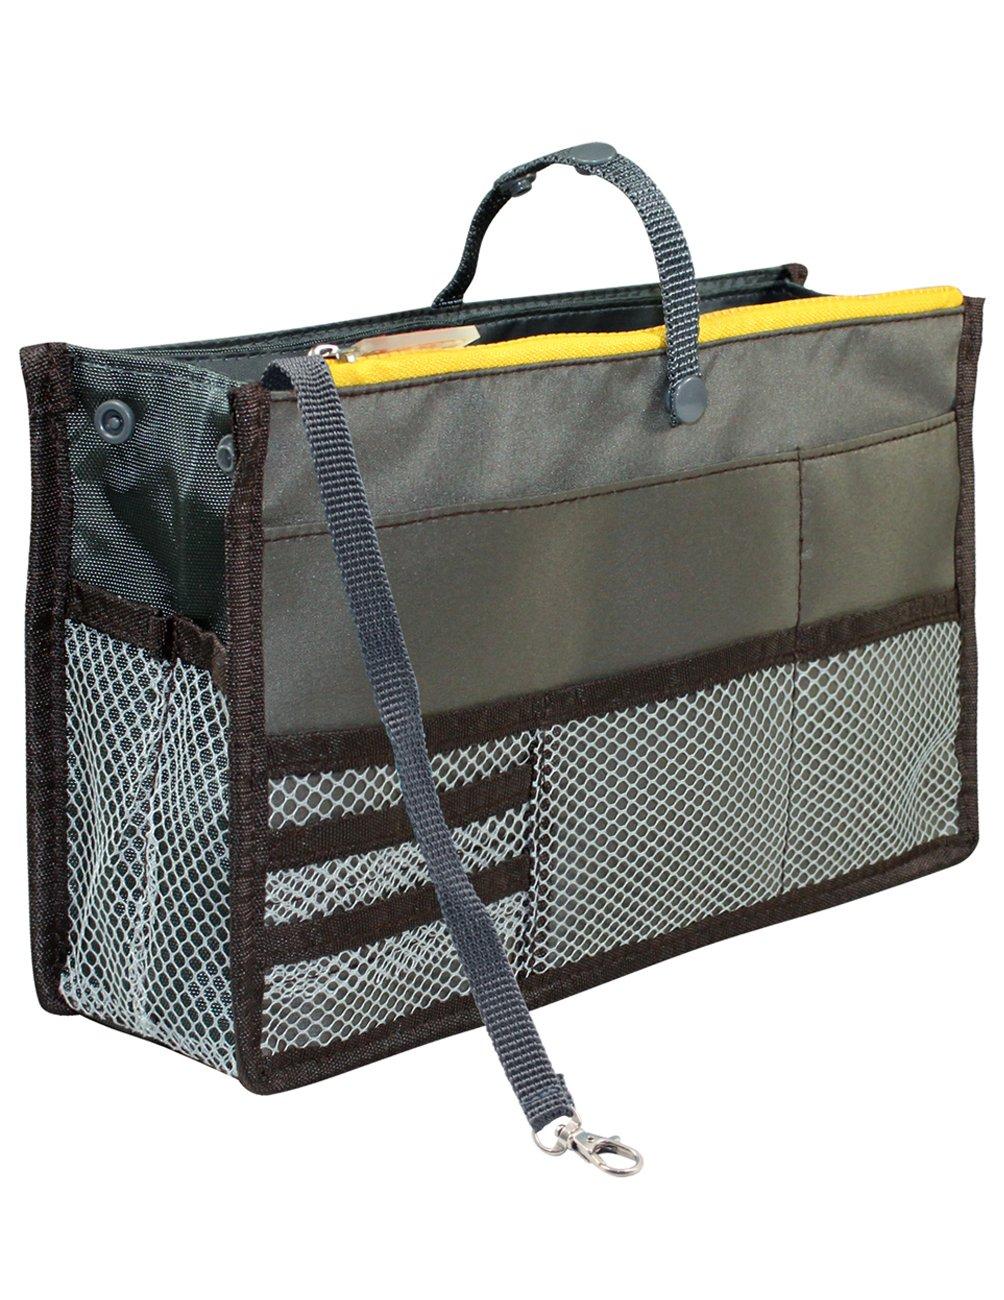 Dahlia Women Patented Handbag Purse Organizer Insert - Version 2 Tidy Gray